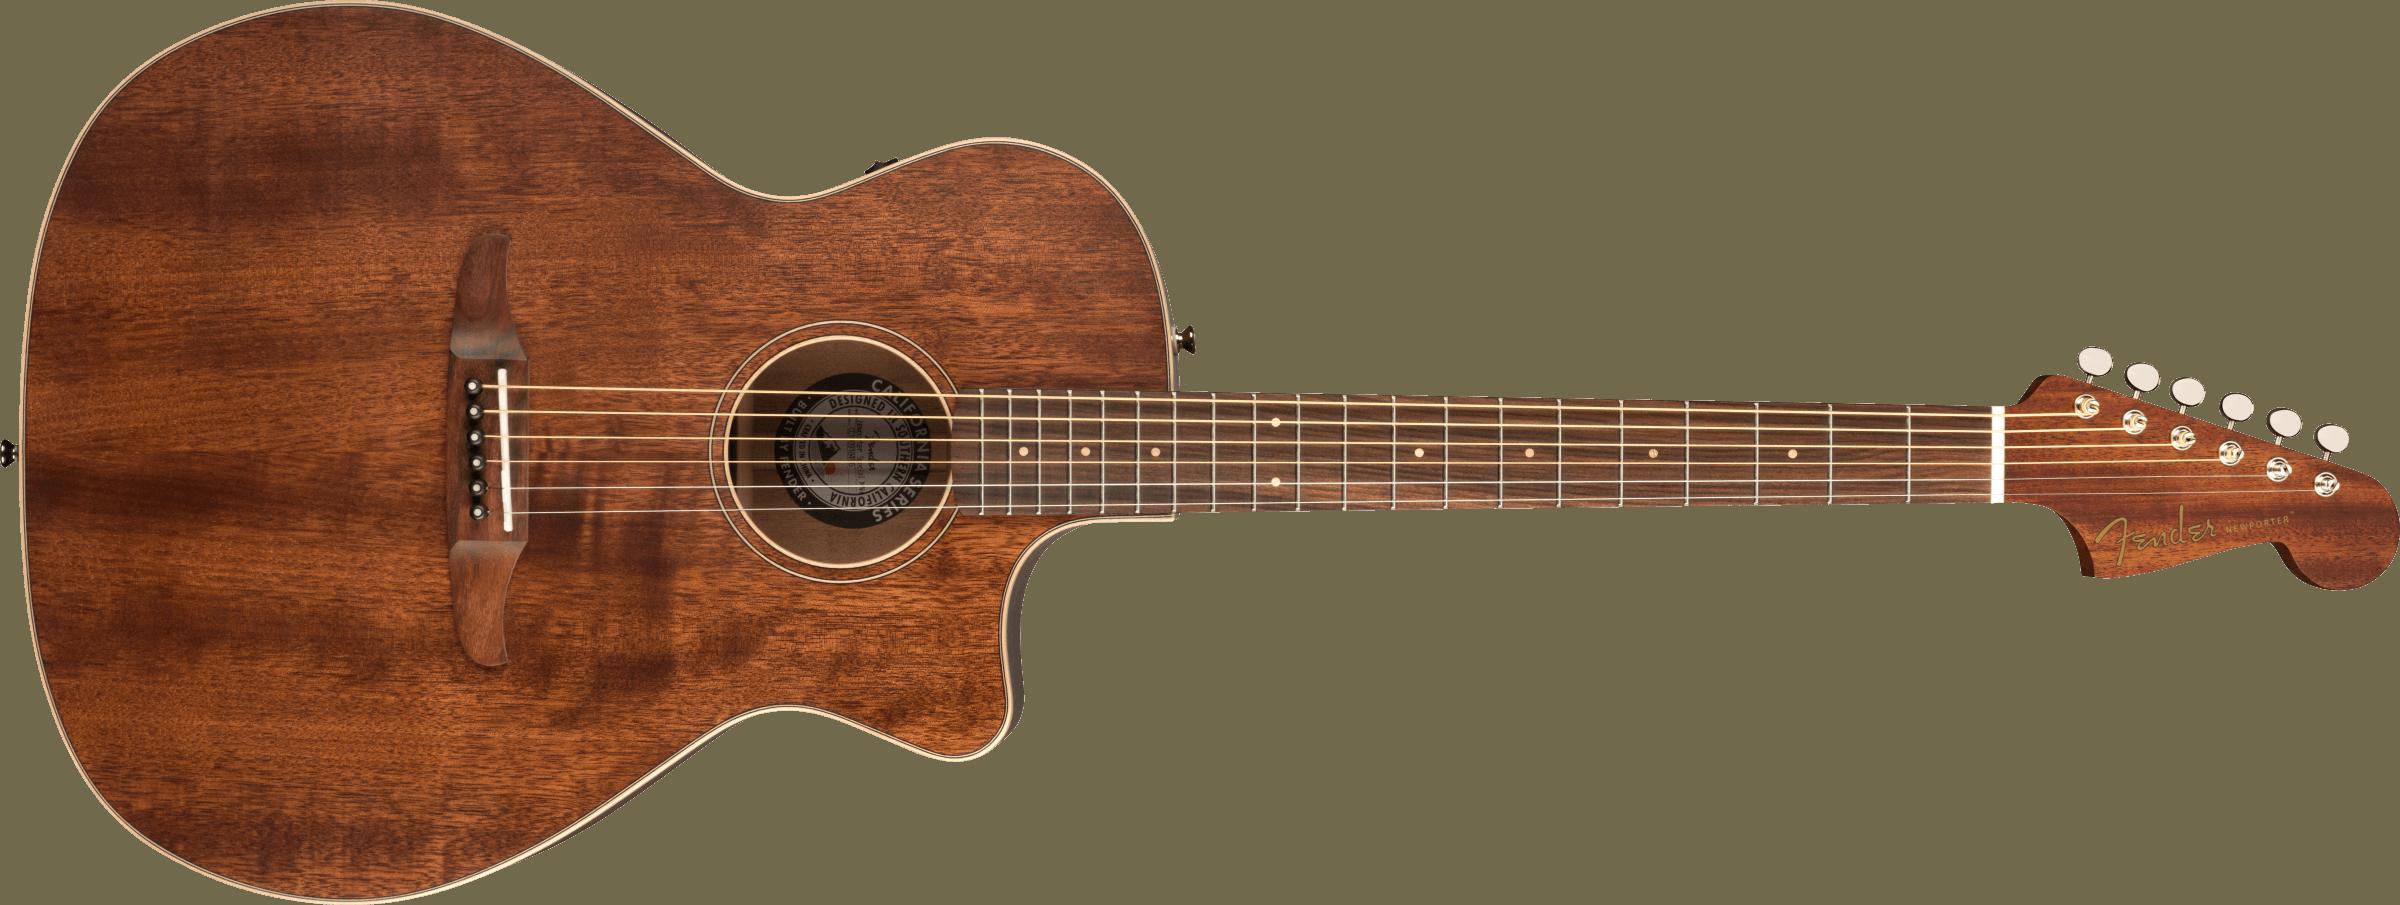 FENDER-Newporter-Special-with-Gig-Bag-All-Mahogany-Pau-Ferro-Fingerboard-Natural-sku-571004885